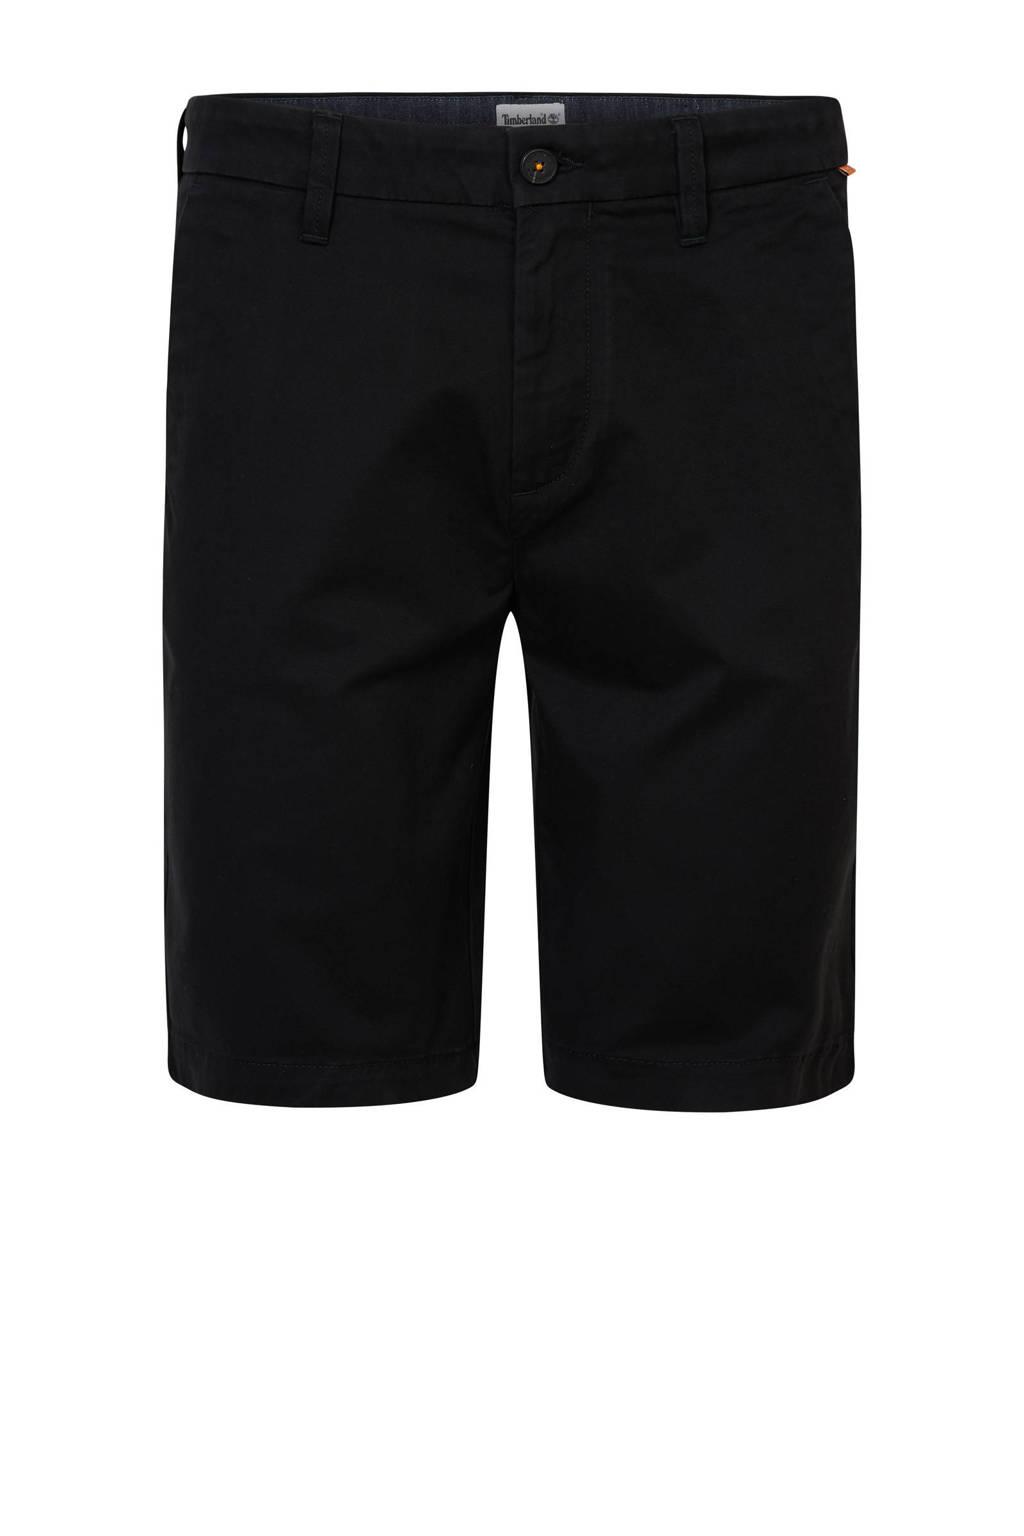 Timberland straight fit bermuda zwart, Zwart